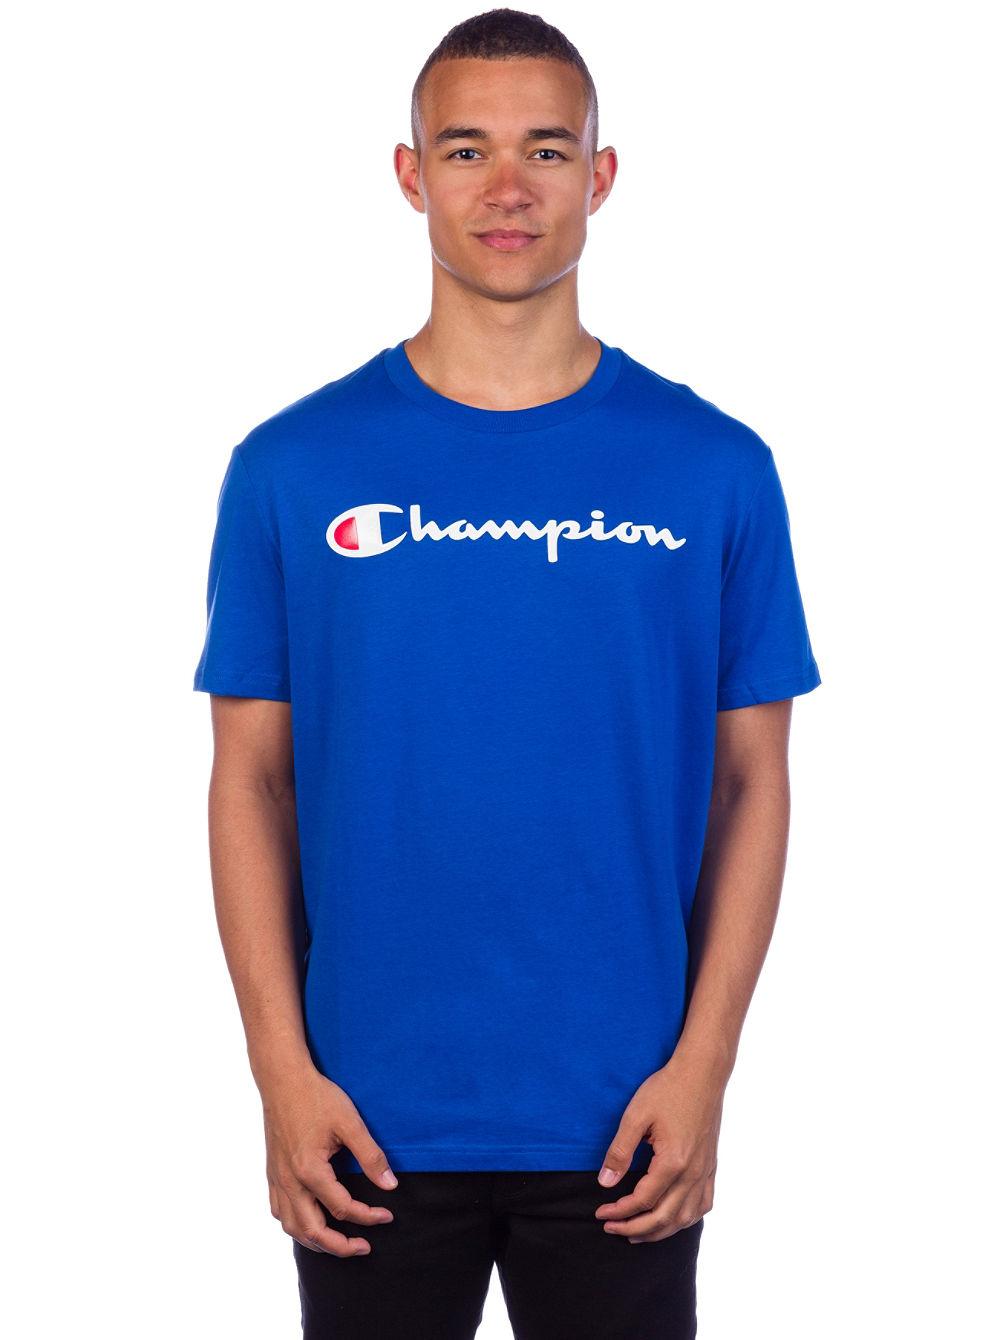 43db0115b292e Buy Champion All American Classic Crewneck T-Shirt online at Blue Tomato